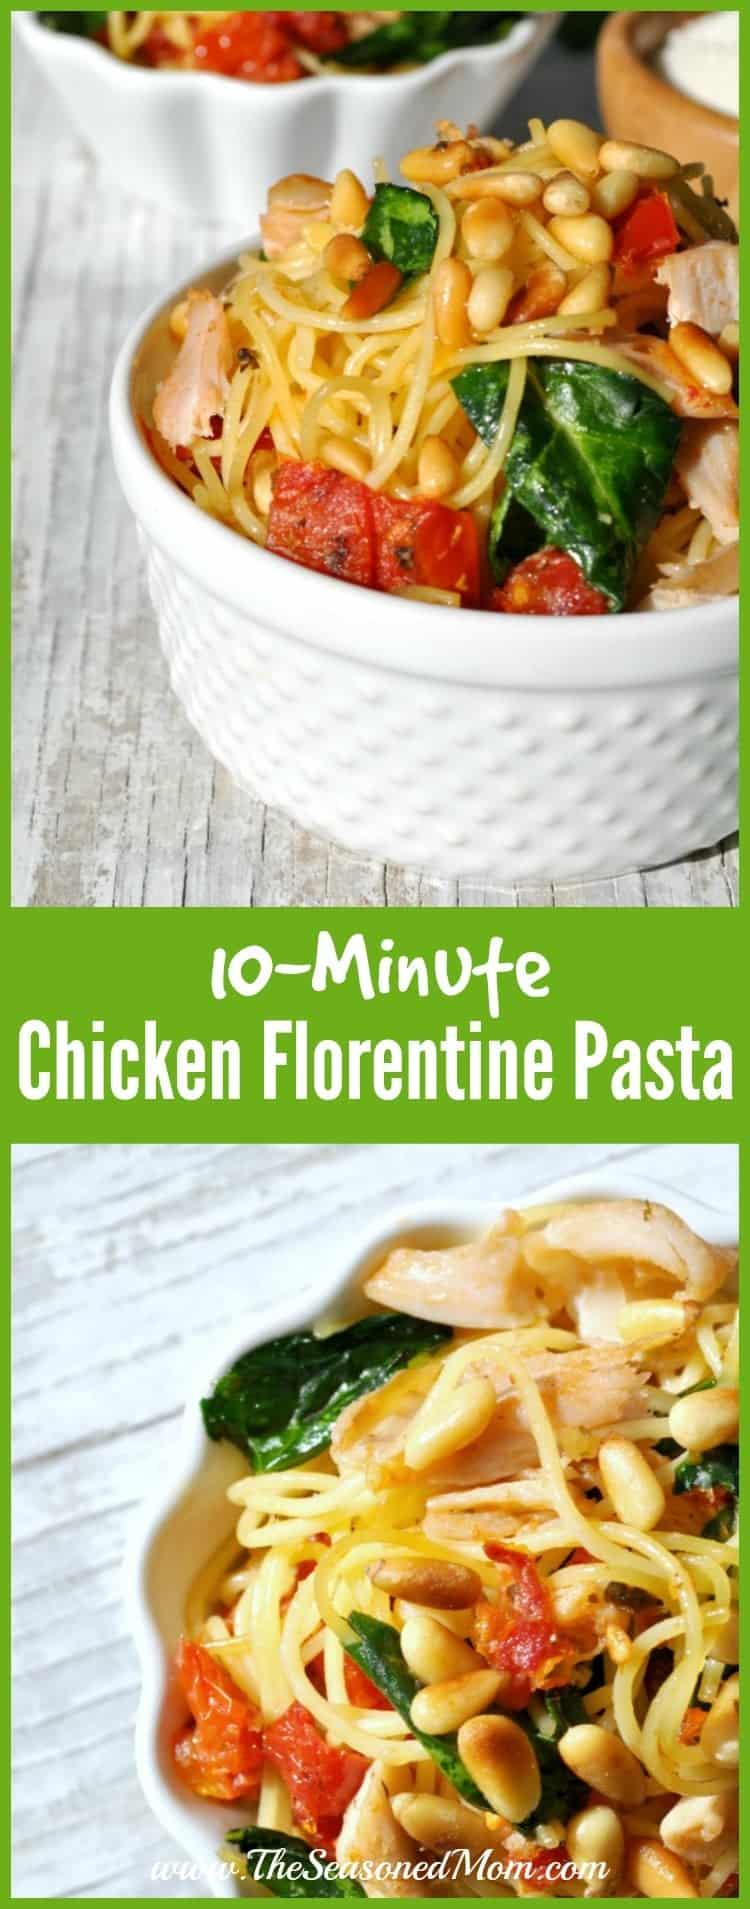 10 Minute Chicken Florentine Pasta - The Seasoned Mom